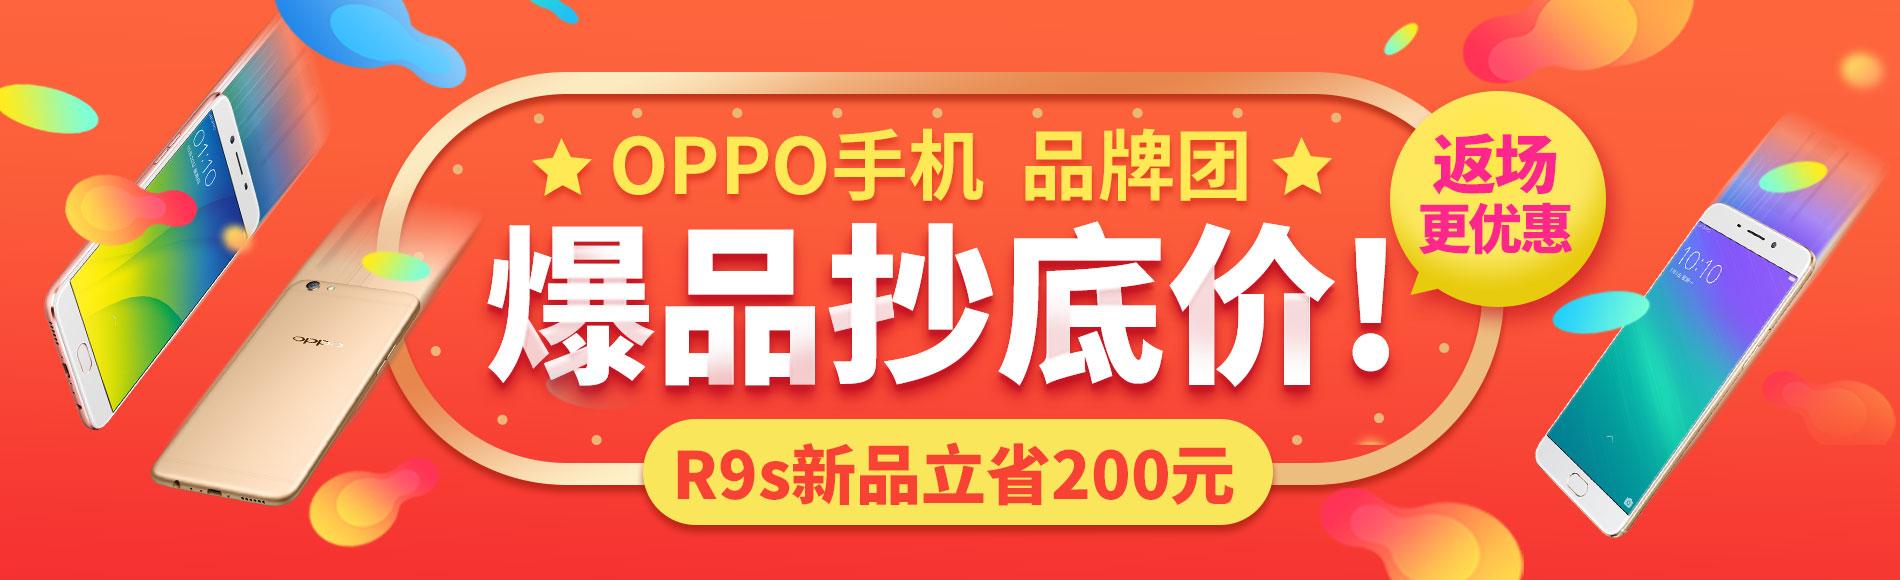 OPPO品牌团